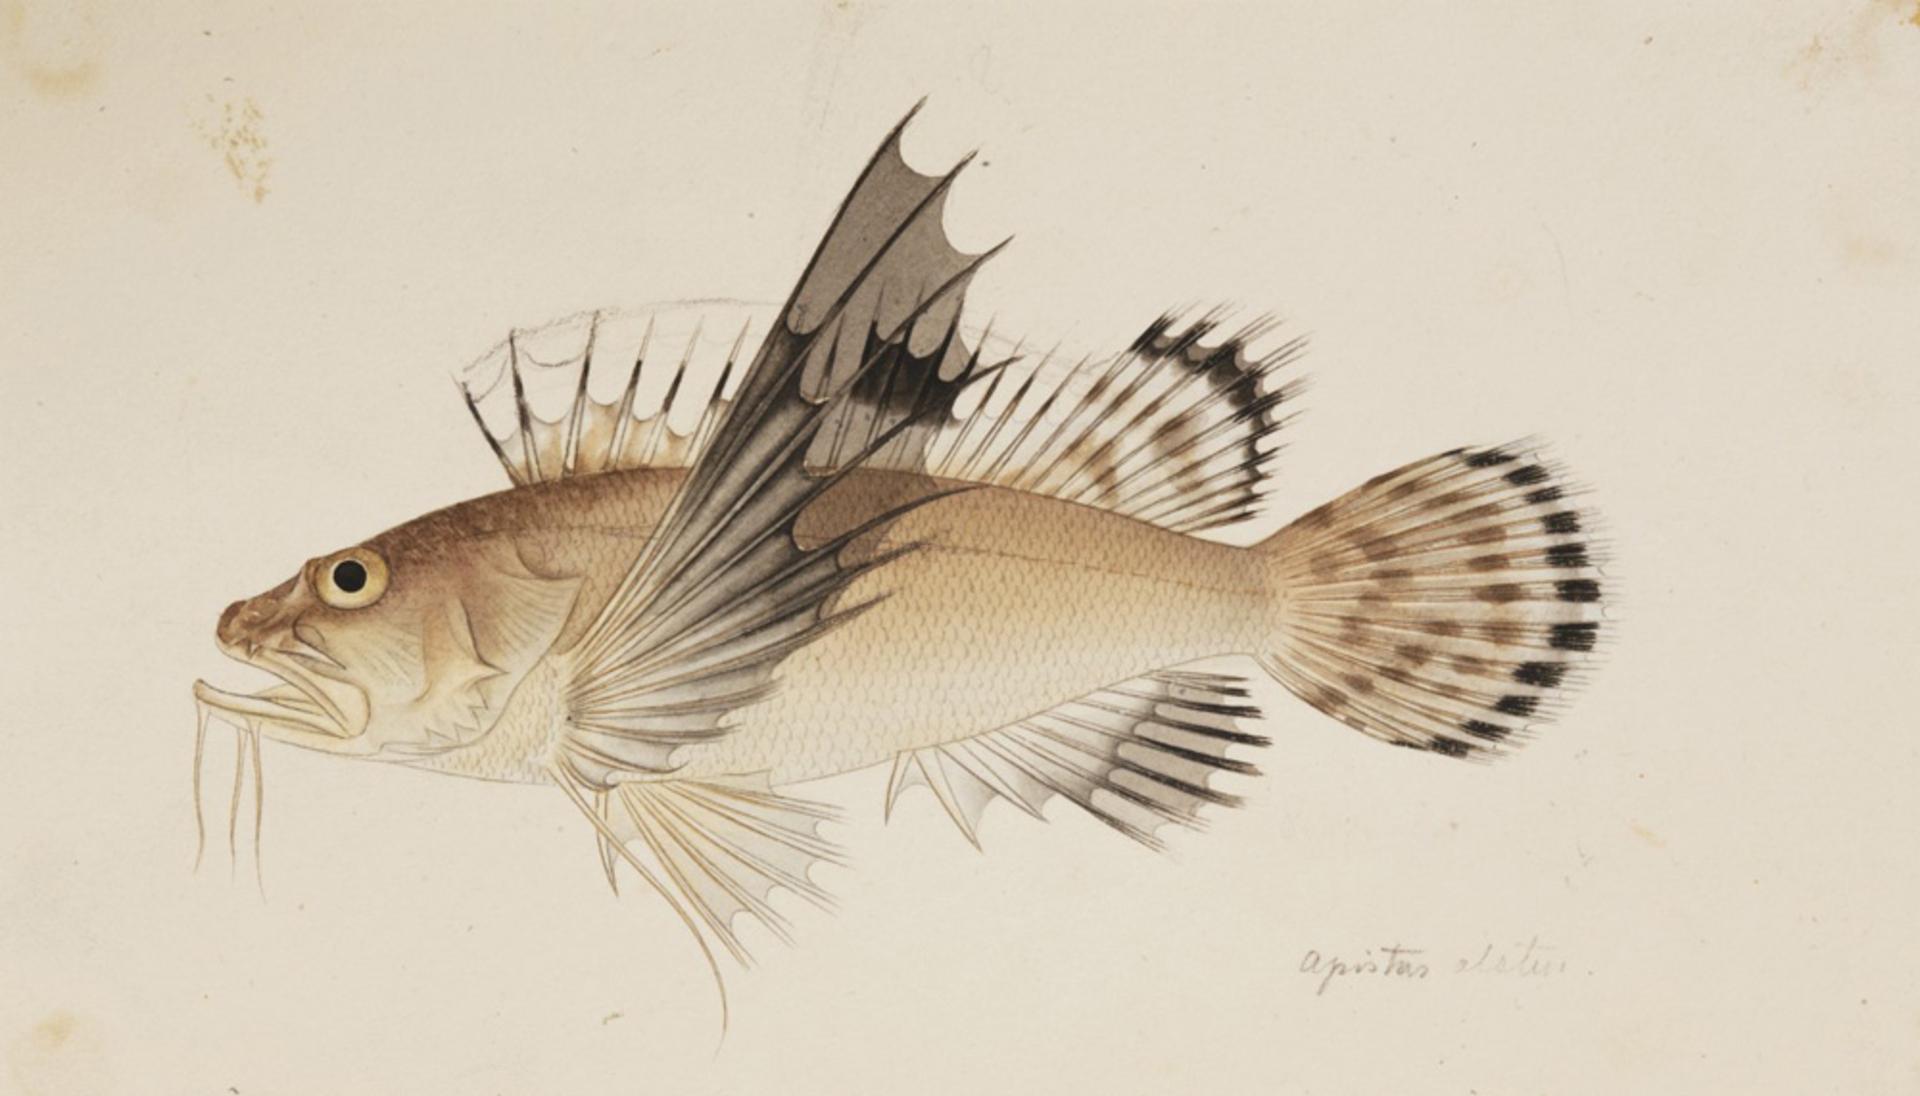 RMNH.ART.223 | Apistus carinatus